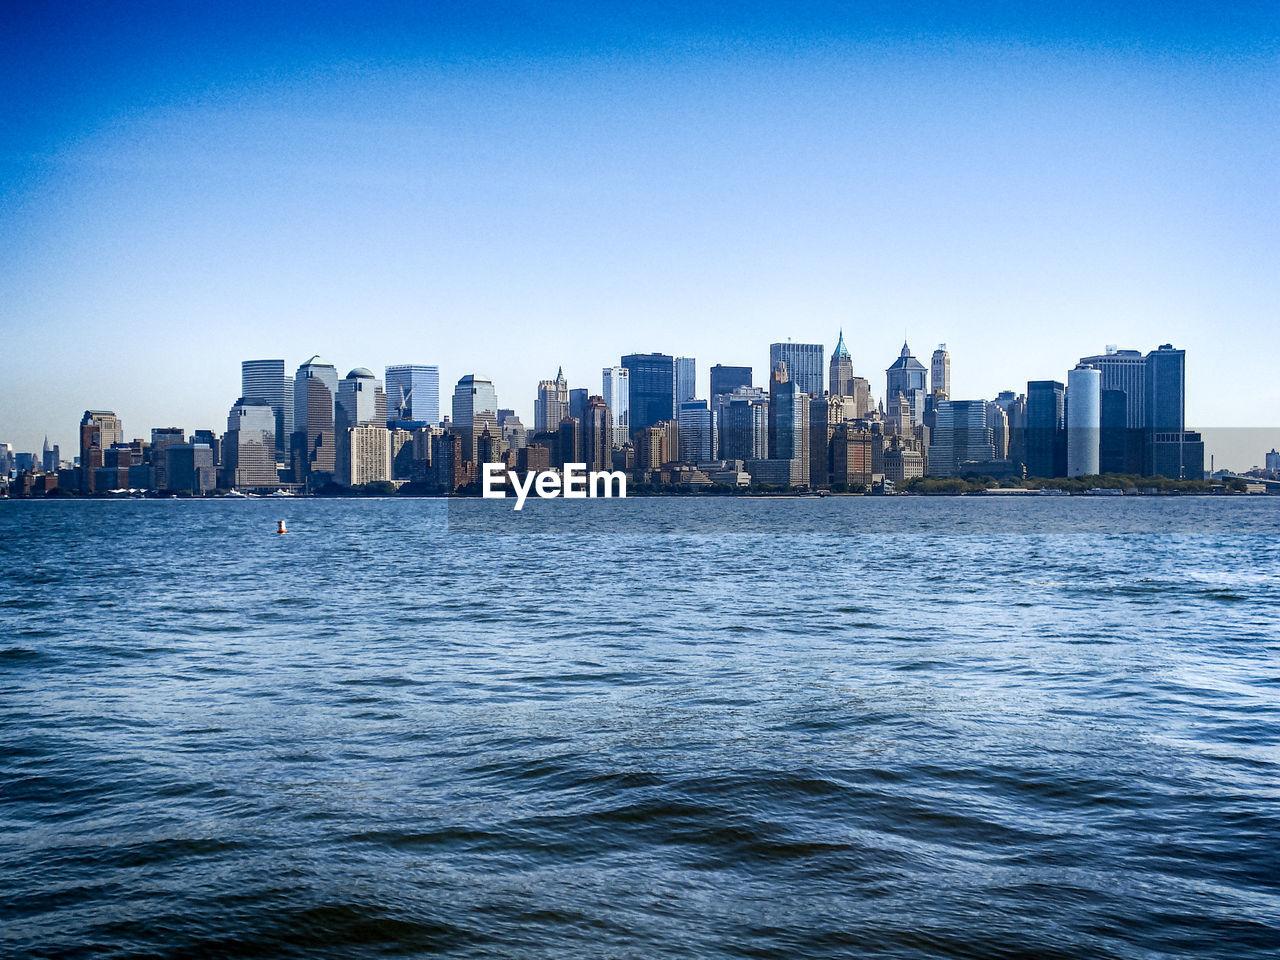 City Skyline By River Against Clear Blue Sky